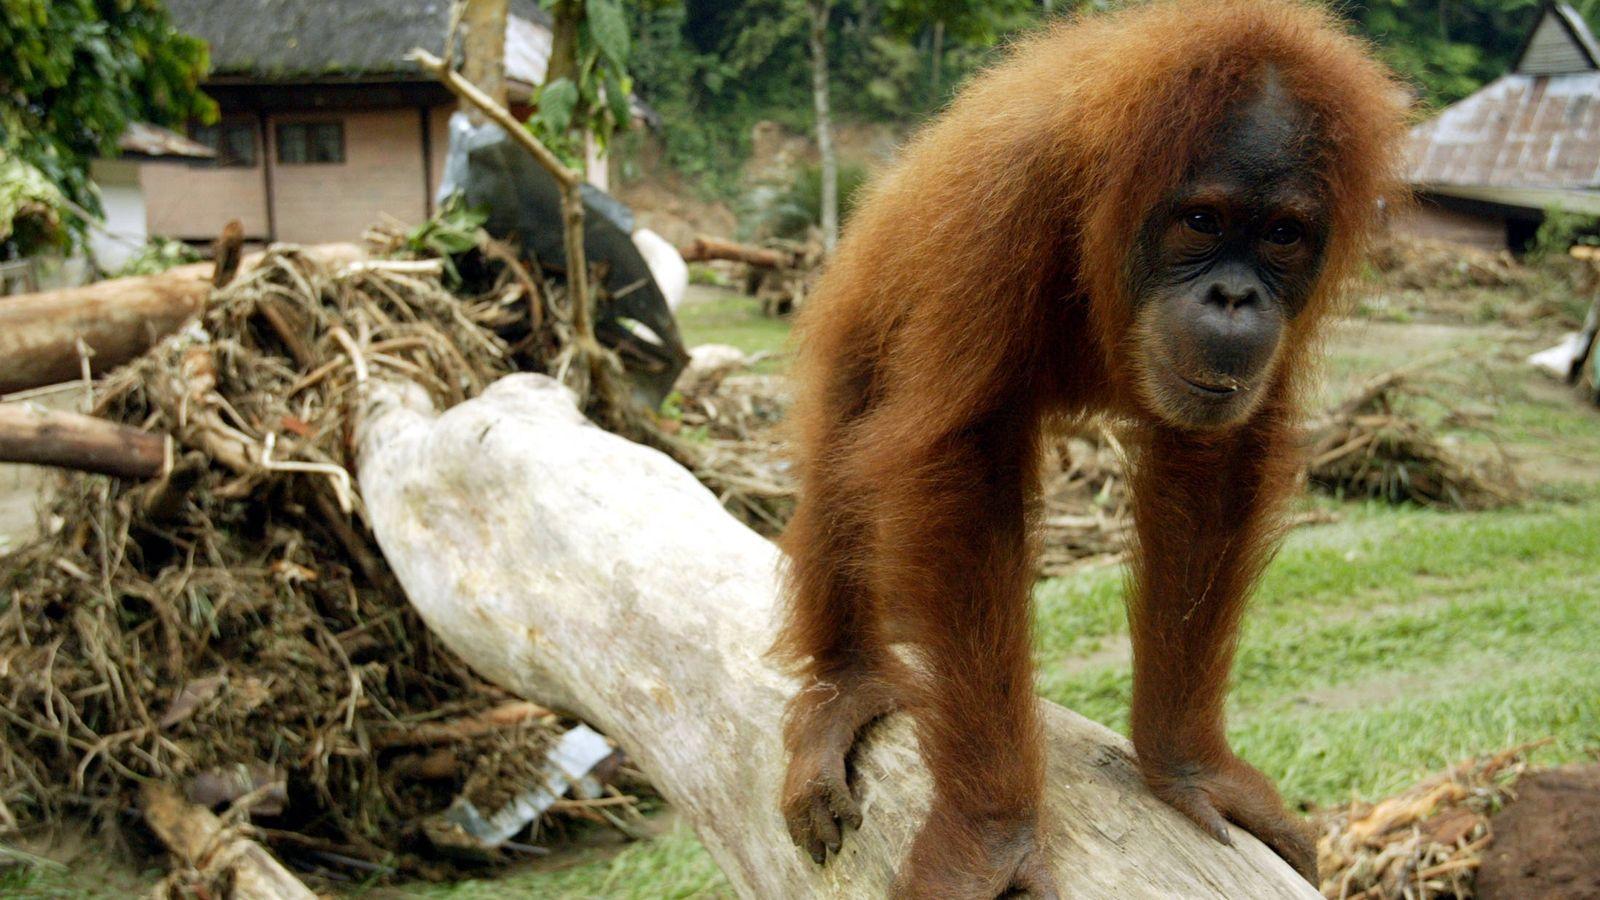 Foto: Un orangután camina sobre un árbol en Bukit Lawang, Bahorok. (Reuters)